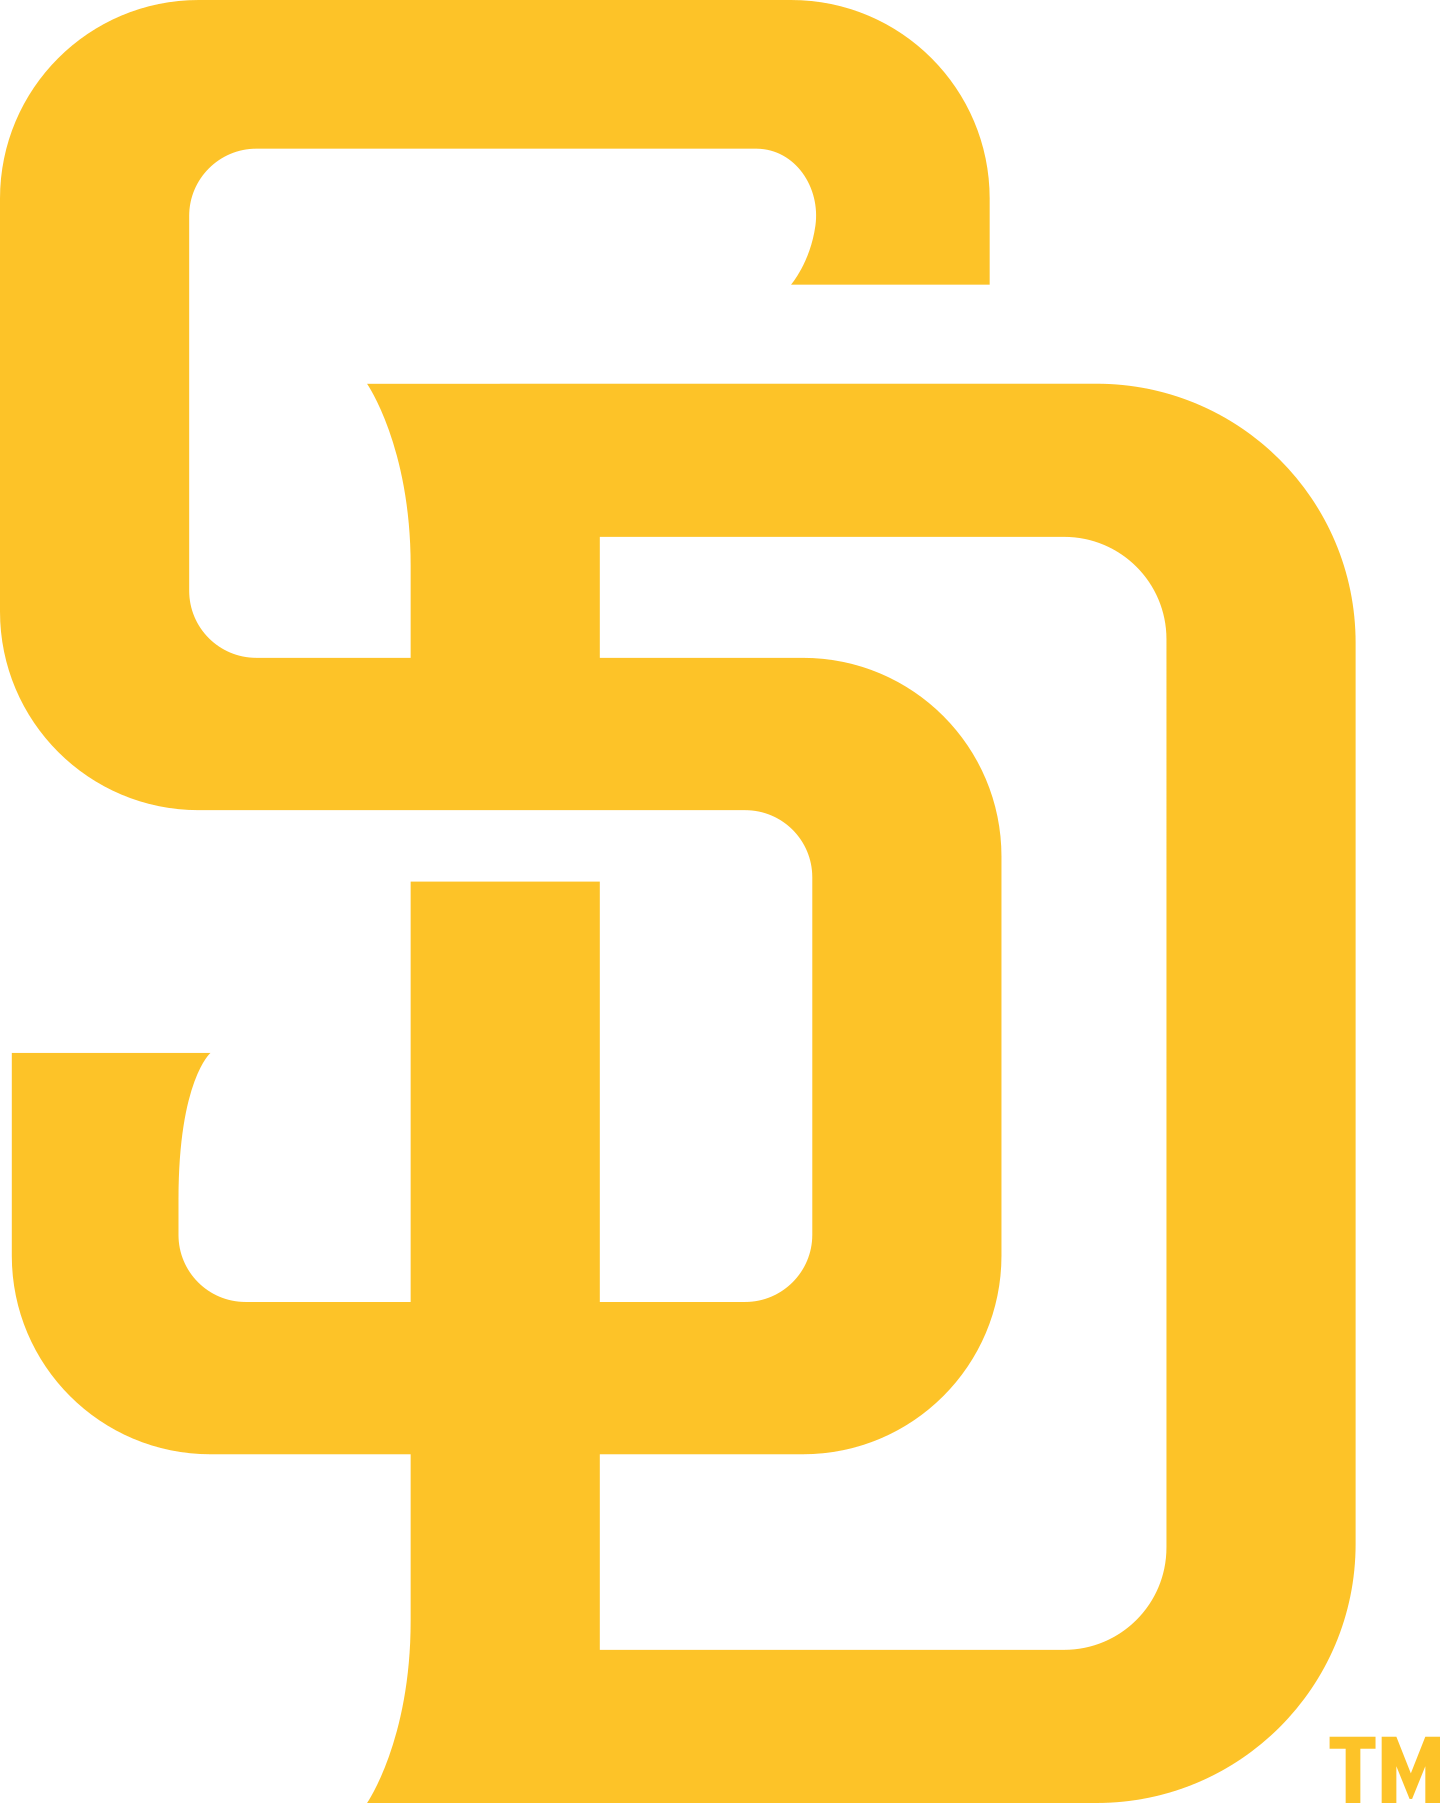 san diego padres logo 3 - San Diego Padres Logo